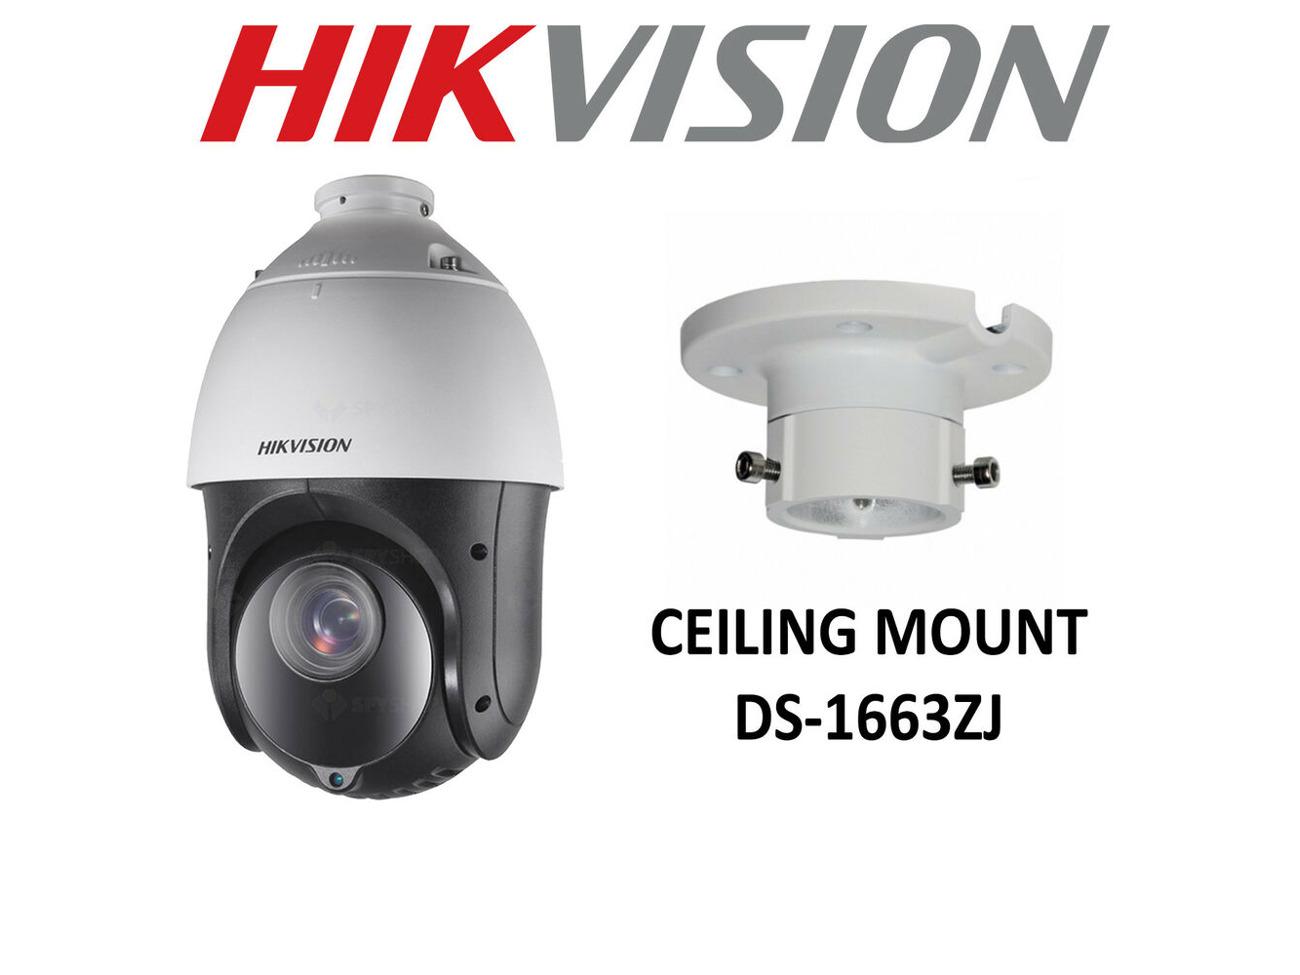 Buy HIKVISION PTZ IP POE CCTV ZOOM CAMERA TURBO HD 100M NIGHT VISION